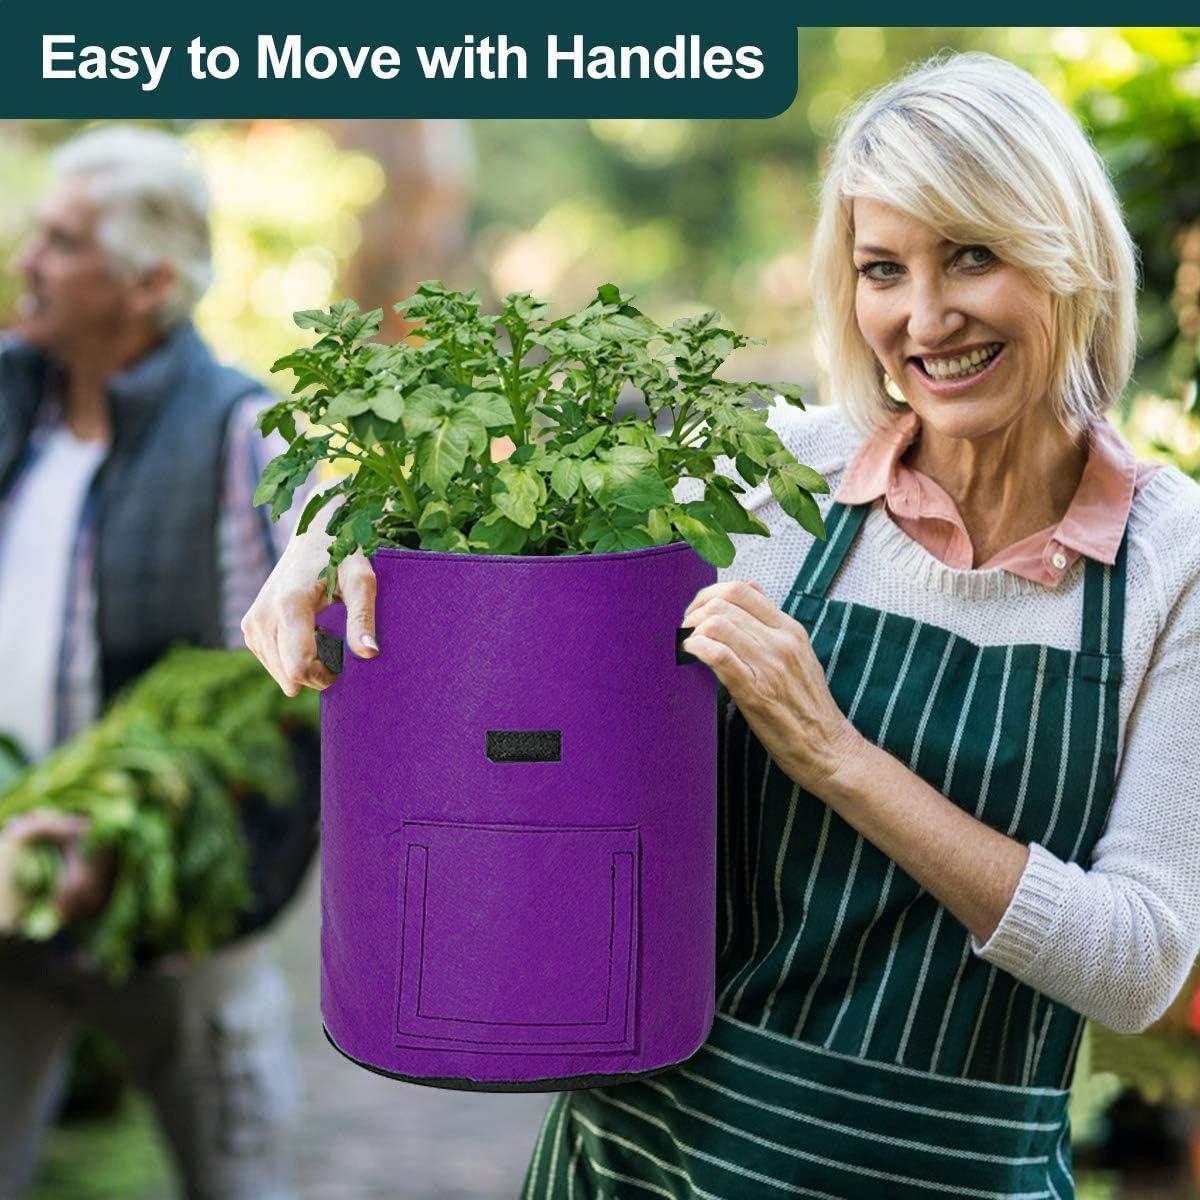 VONLUXE Potato Grow Bags 3pcs 10 Gallon Potato Growing Bags Smart Potato Planting Bag Velcro Window Universal Grow Bags with Flap and Handles for Potato Carrot Purple Tomato